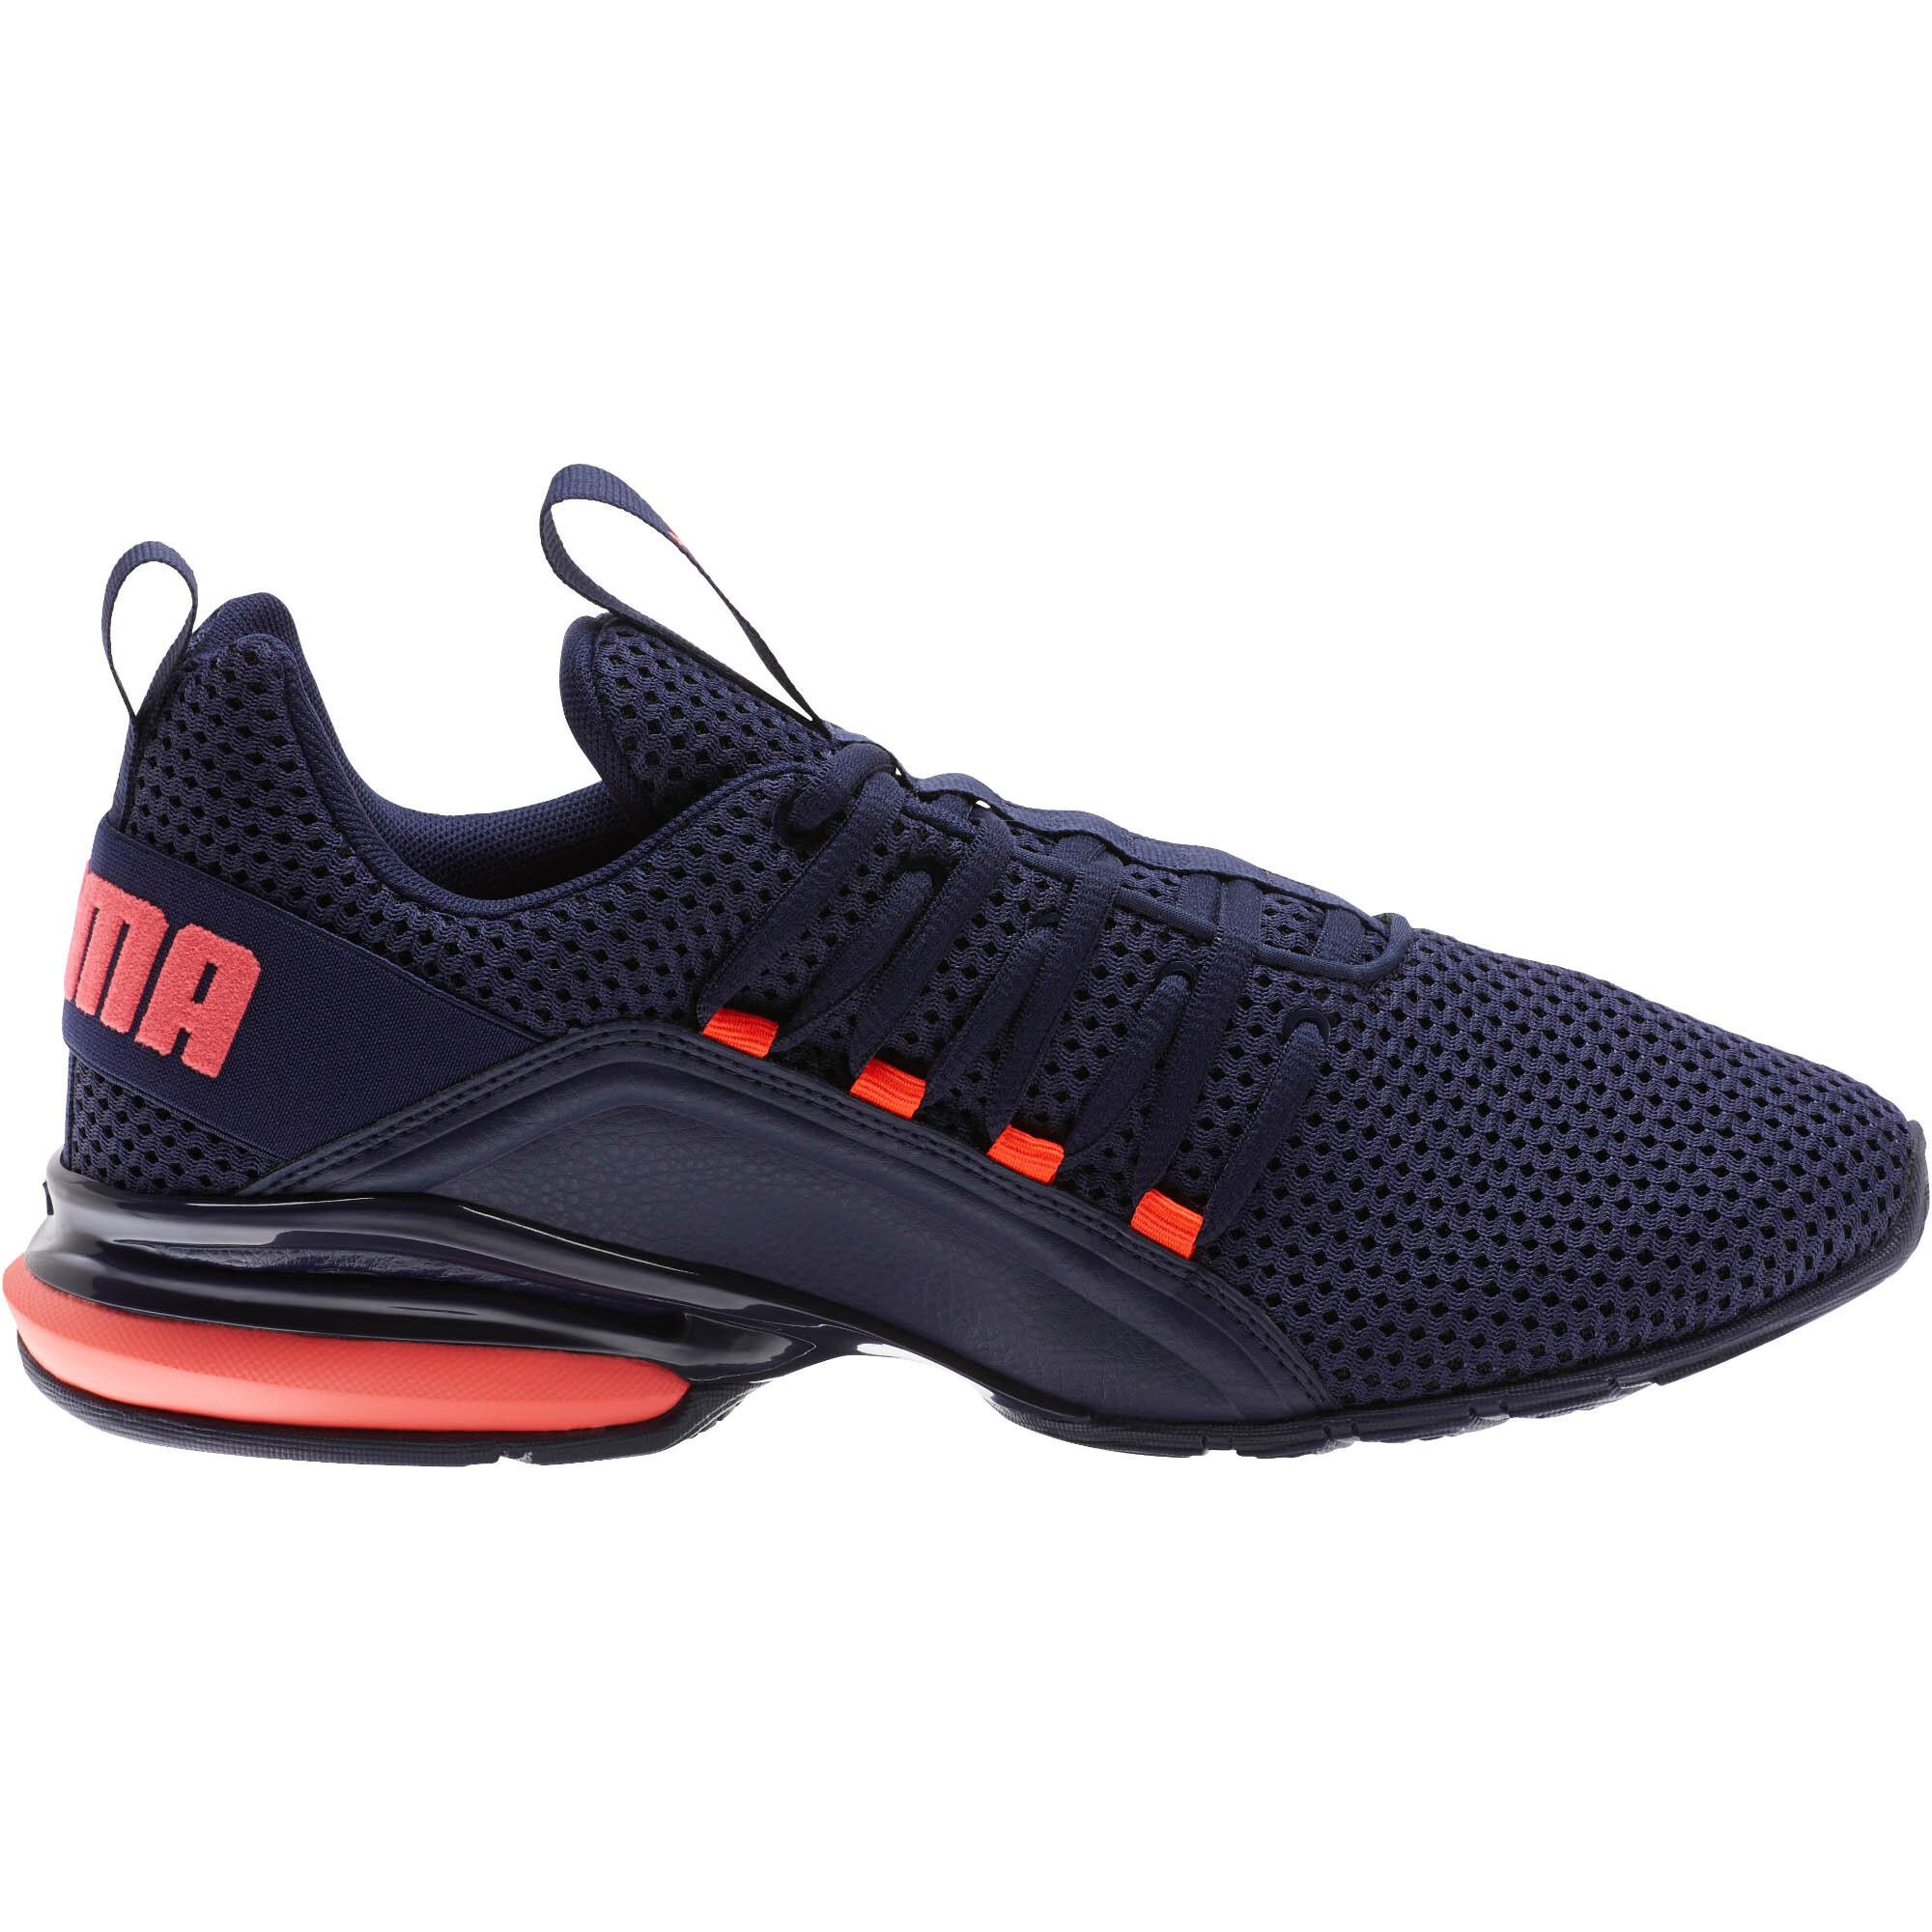 PUMA-Axelion-Breathe-Men-s-Training-Shoes-Men-Shoe-Running thumbnail 5